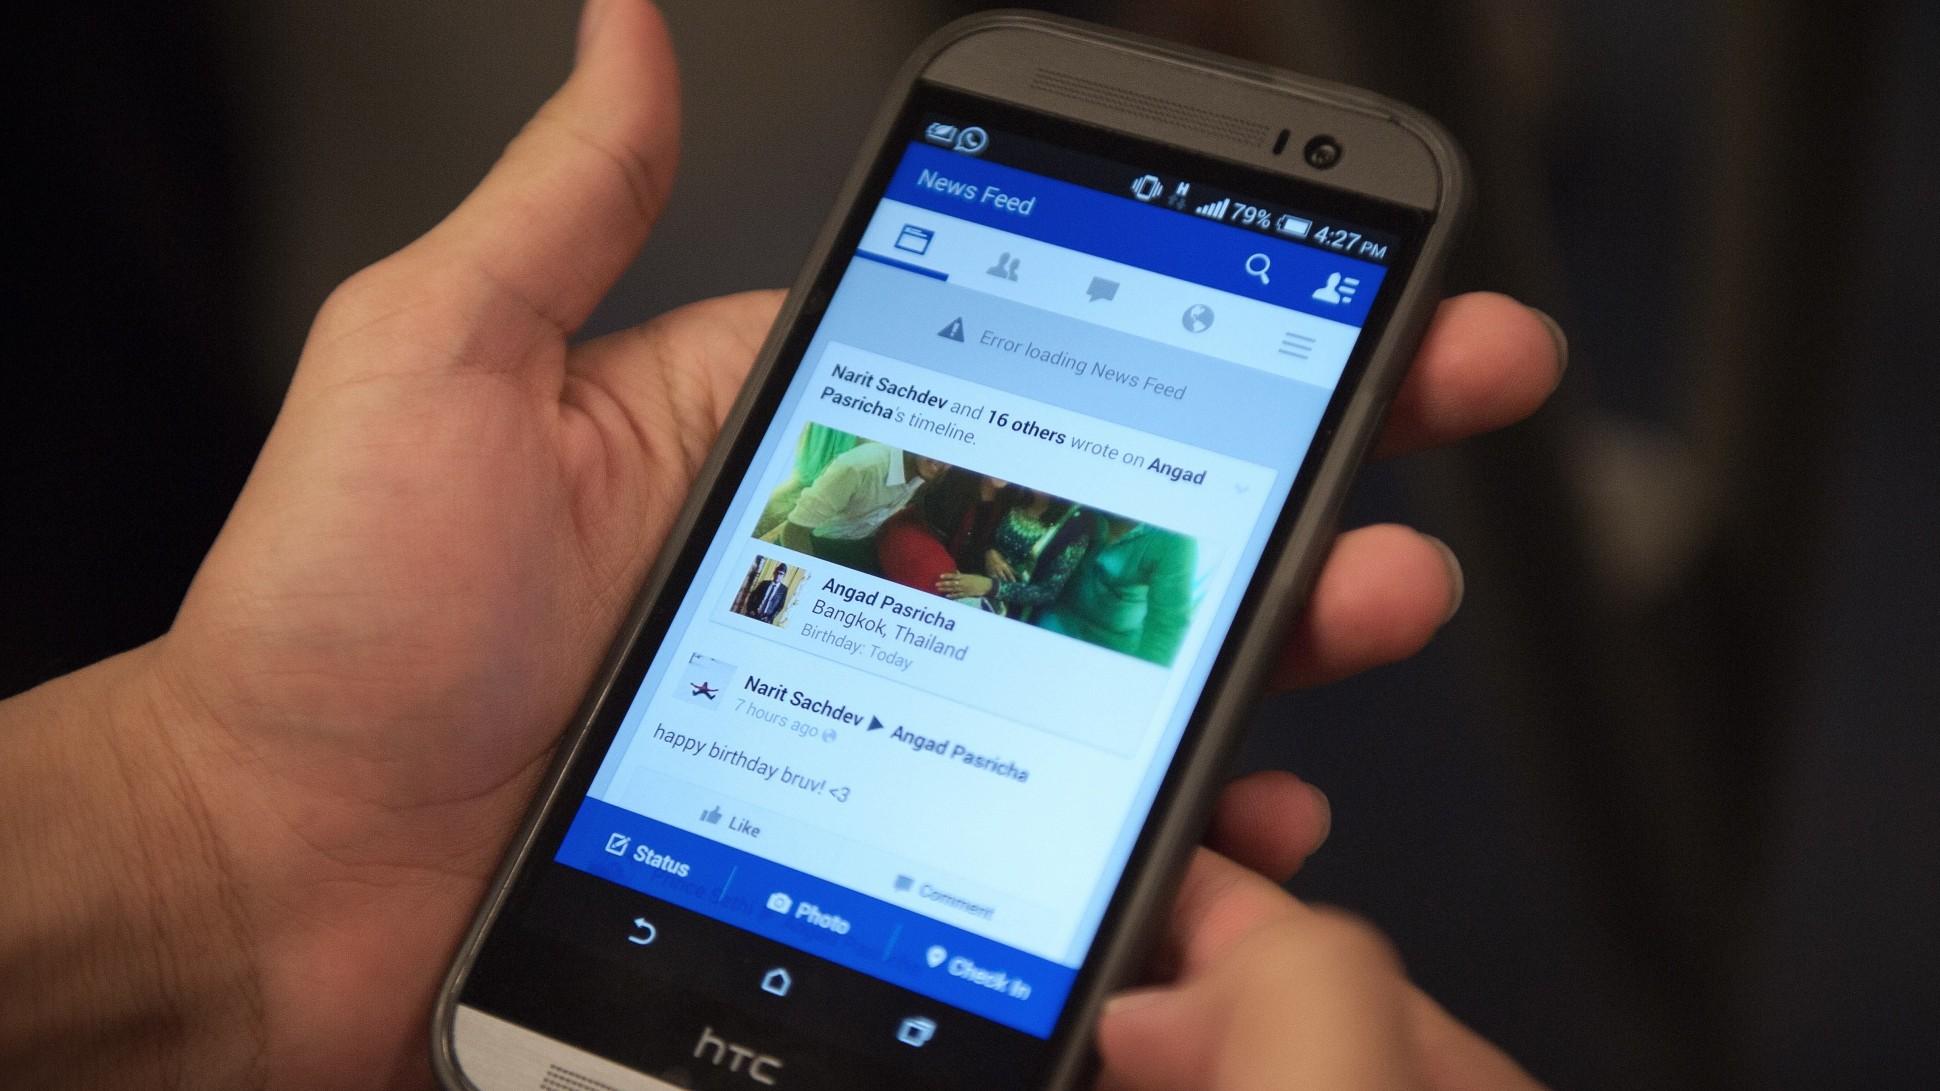 Facebook-testing multiple news feeds